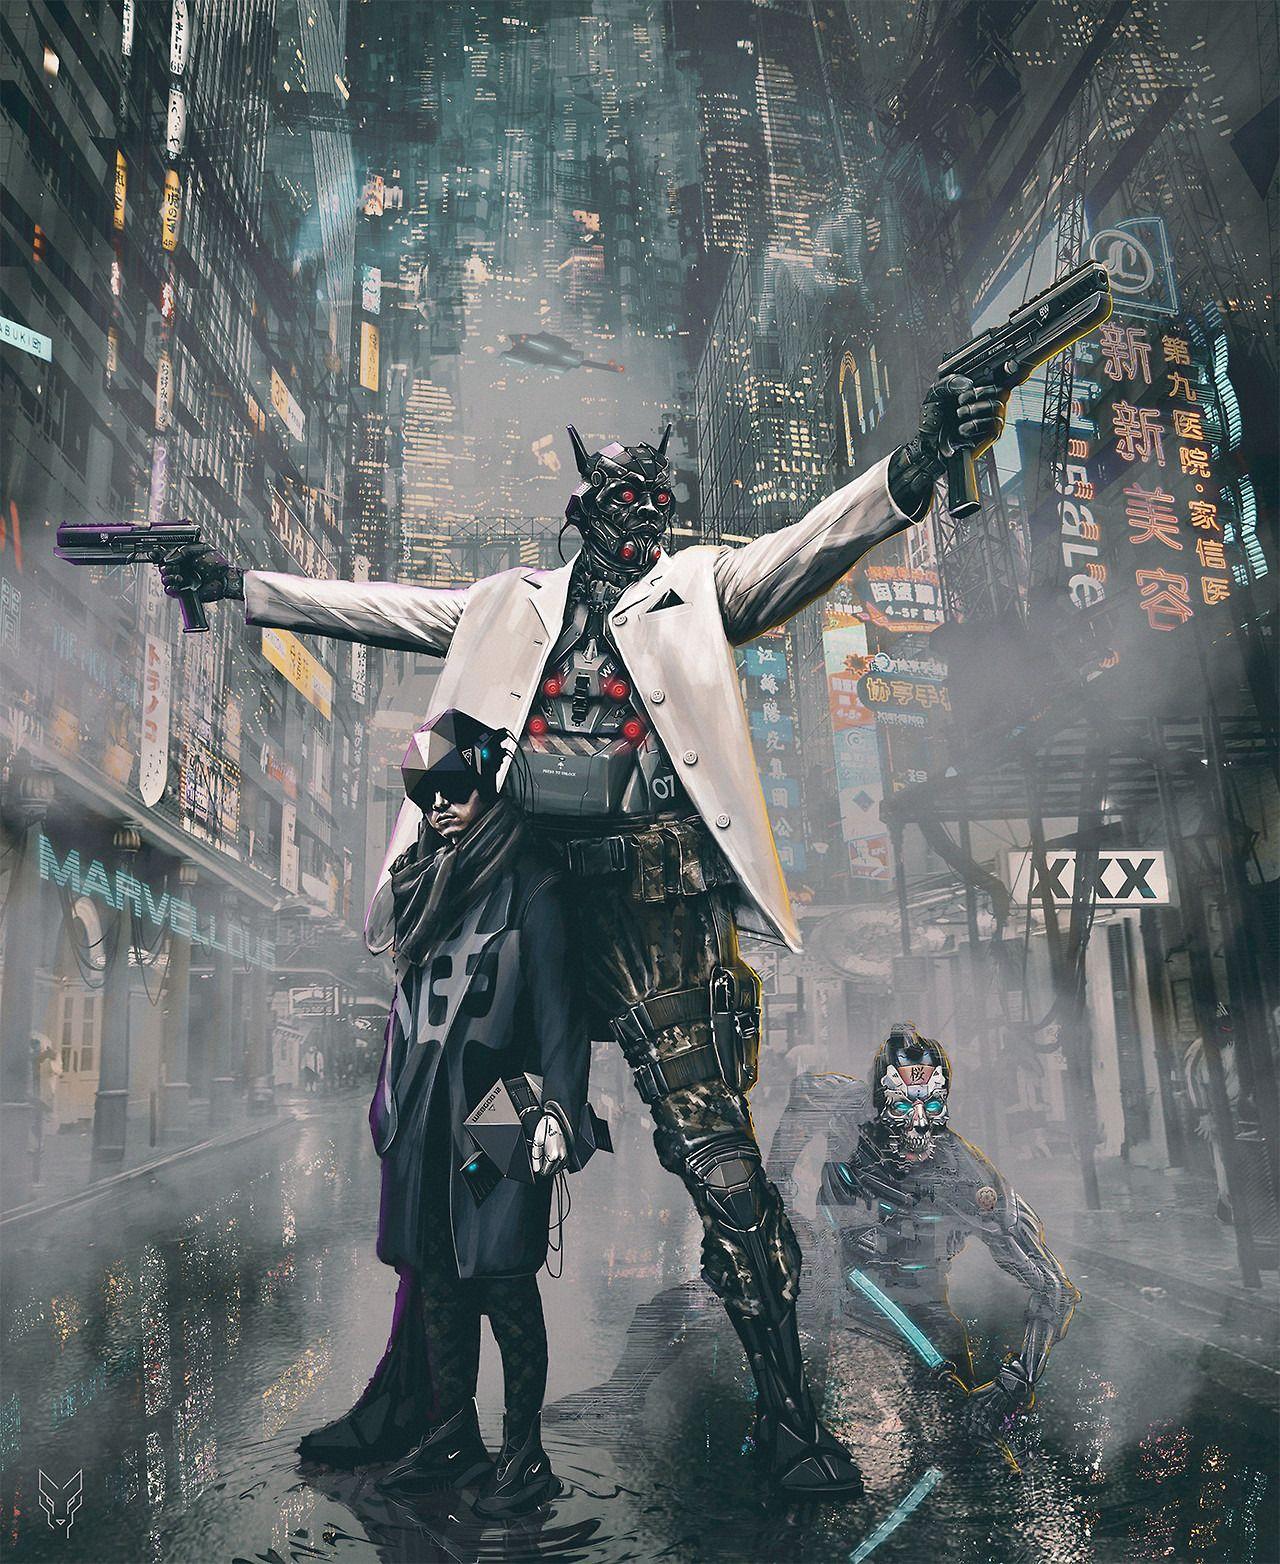 Cypulchre Cyberpunk Cyberpunk Rpg Cyberpunk City